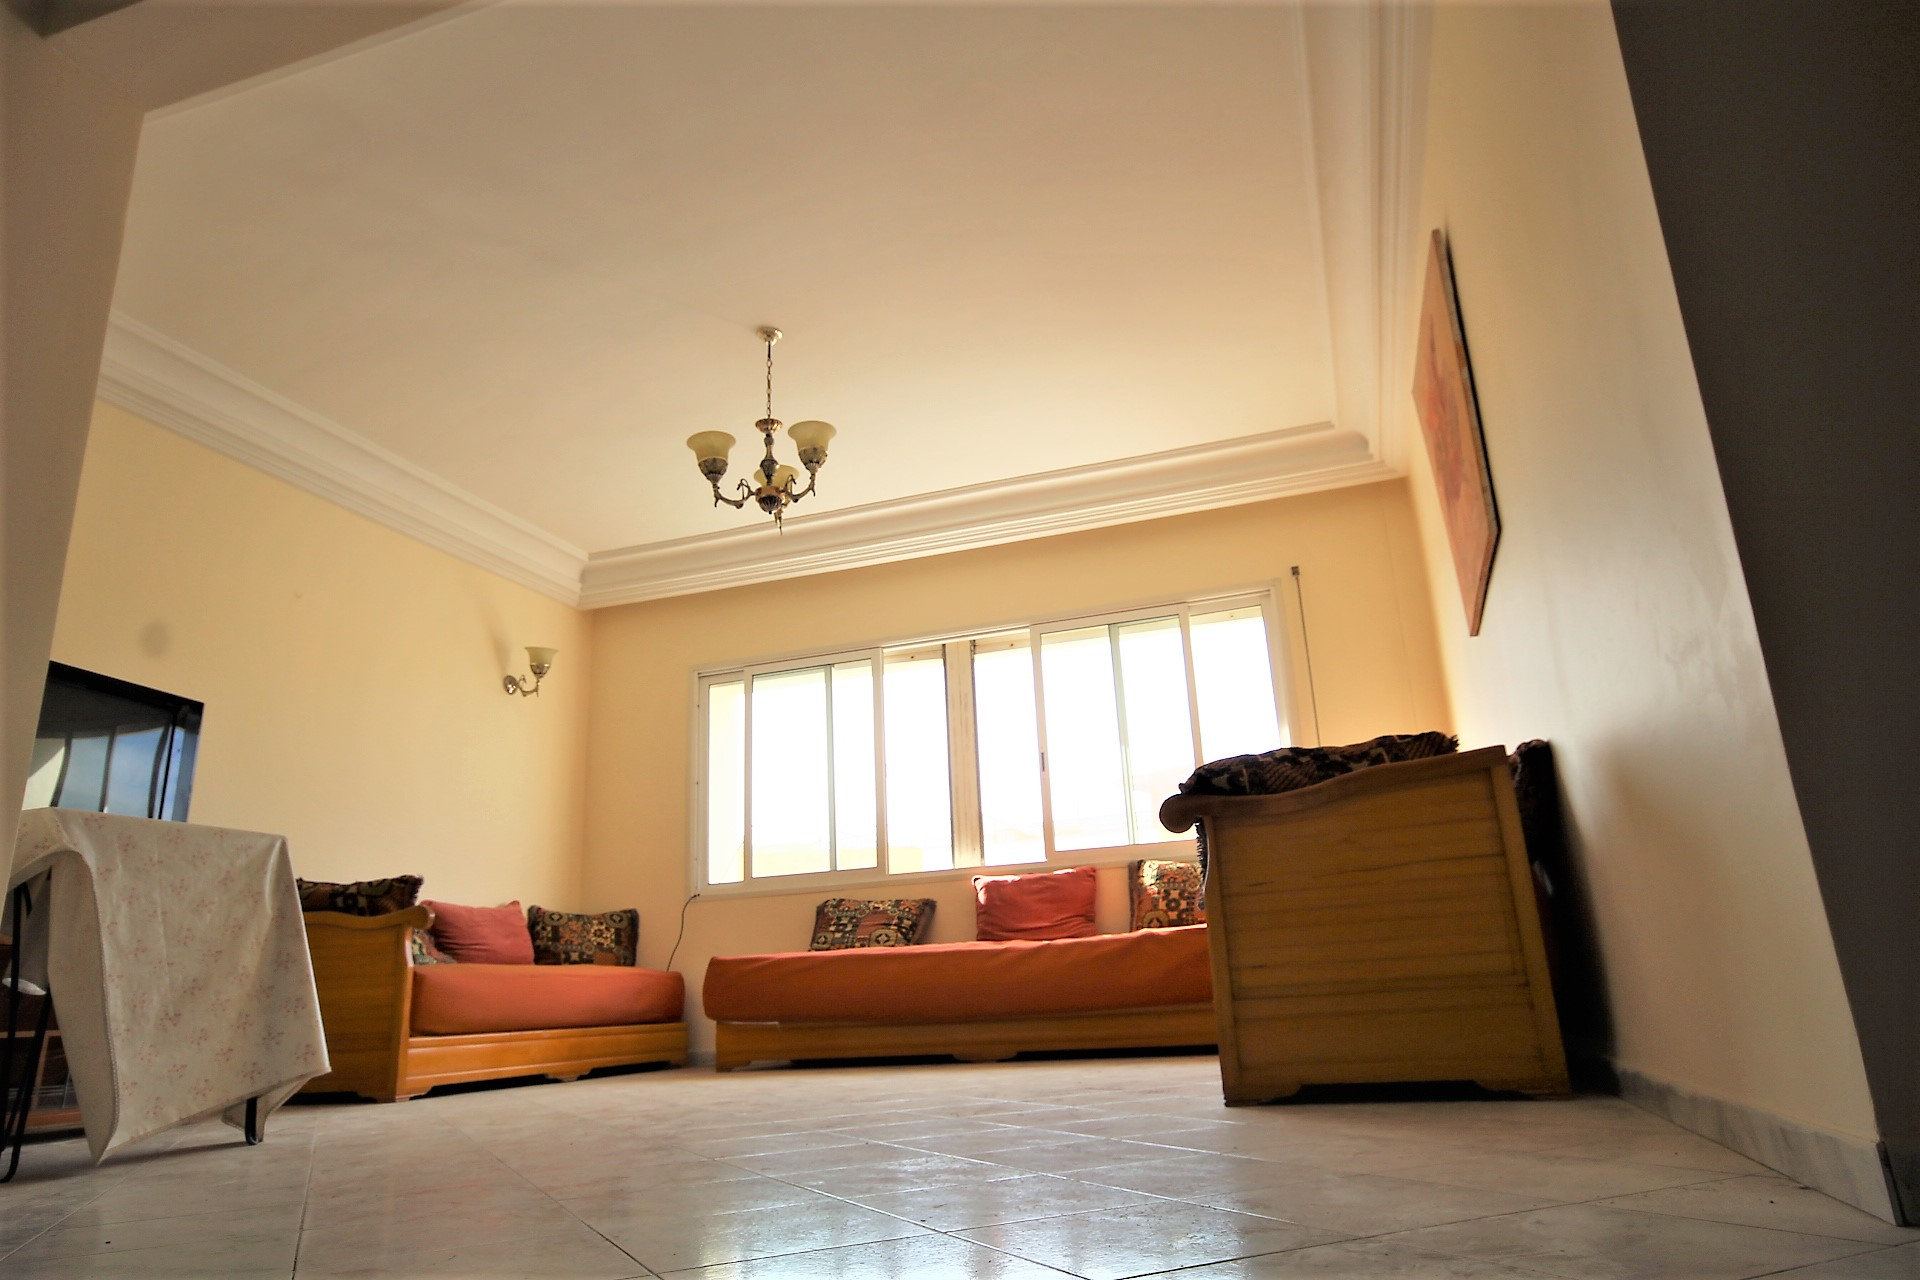 Casablanca, Bourgogne, loue appartement 3 chambres proche de la corniche Hassan 2